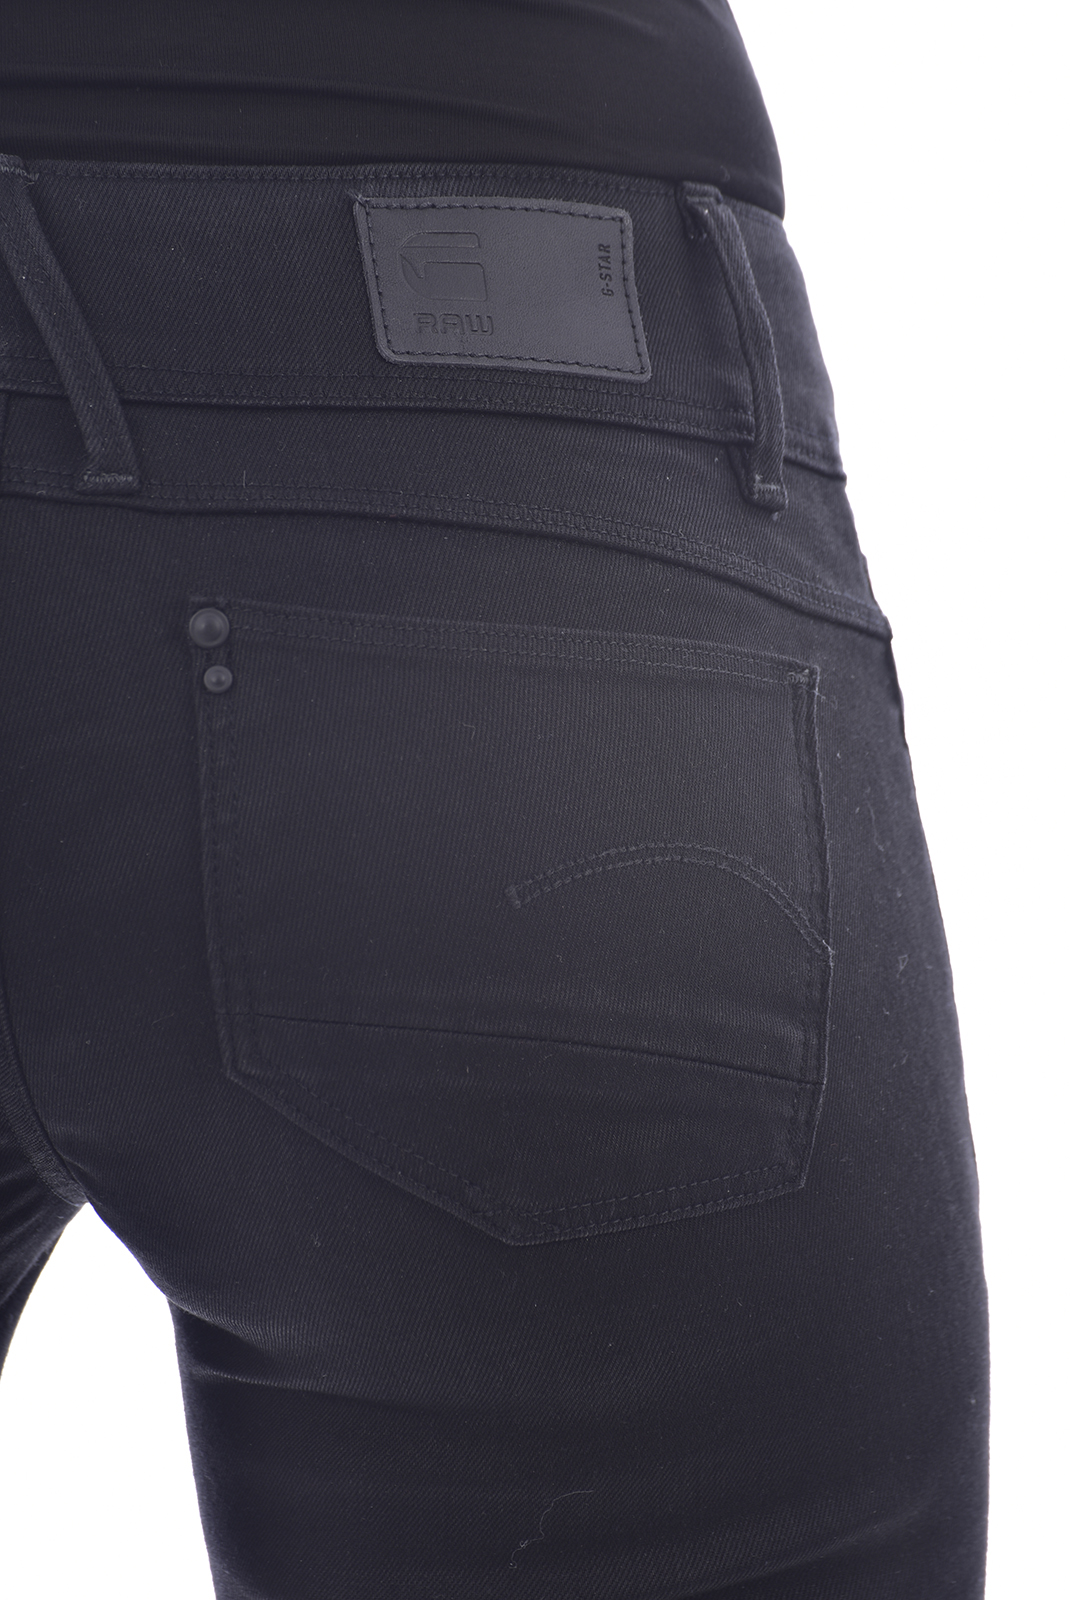 Jeans   G-star 60885.6009.082 NOIR